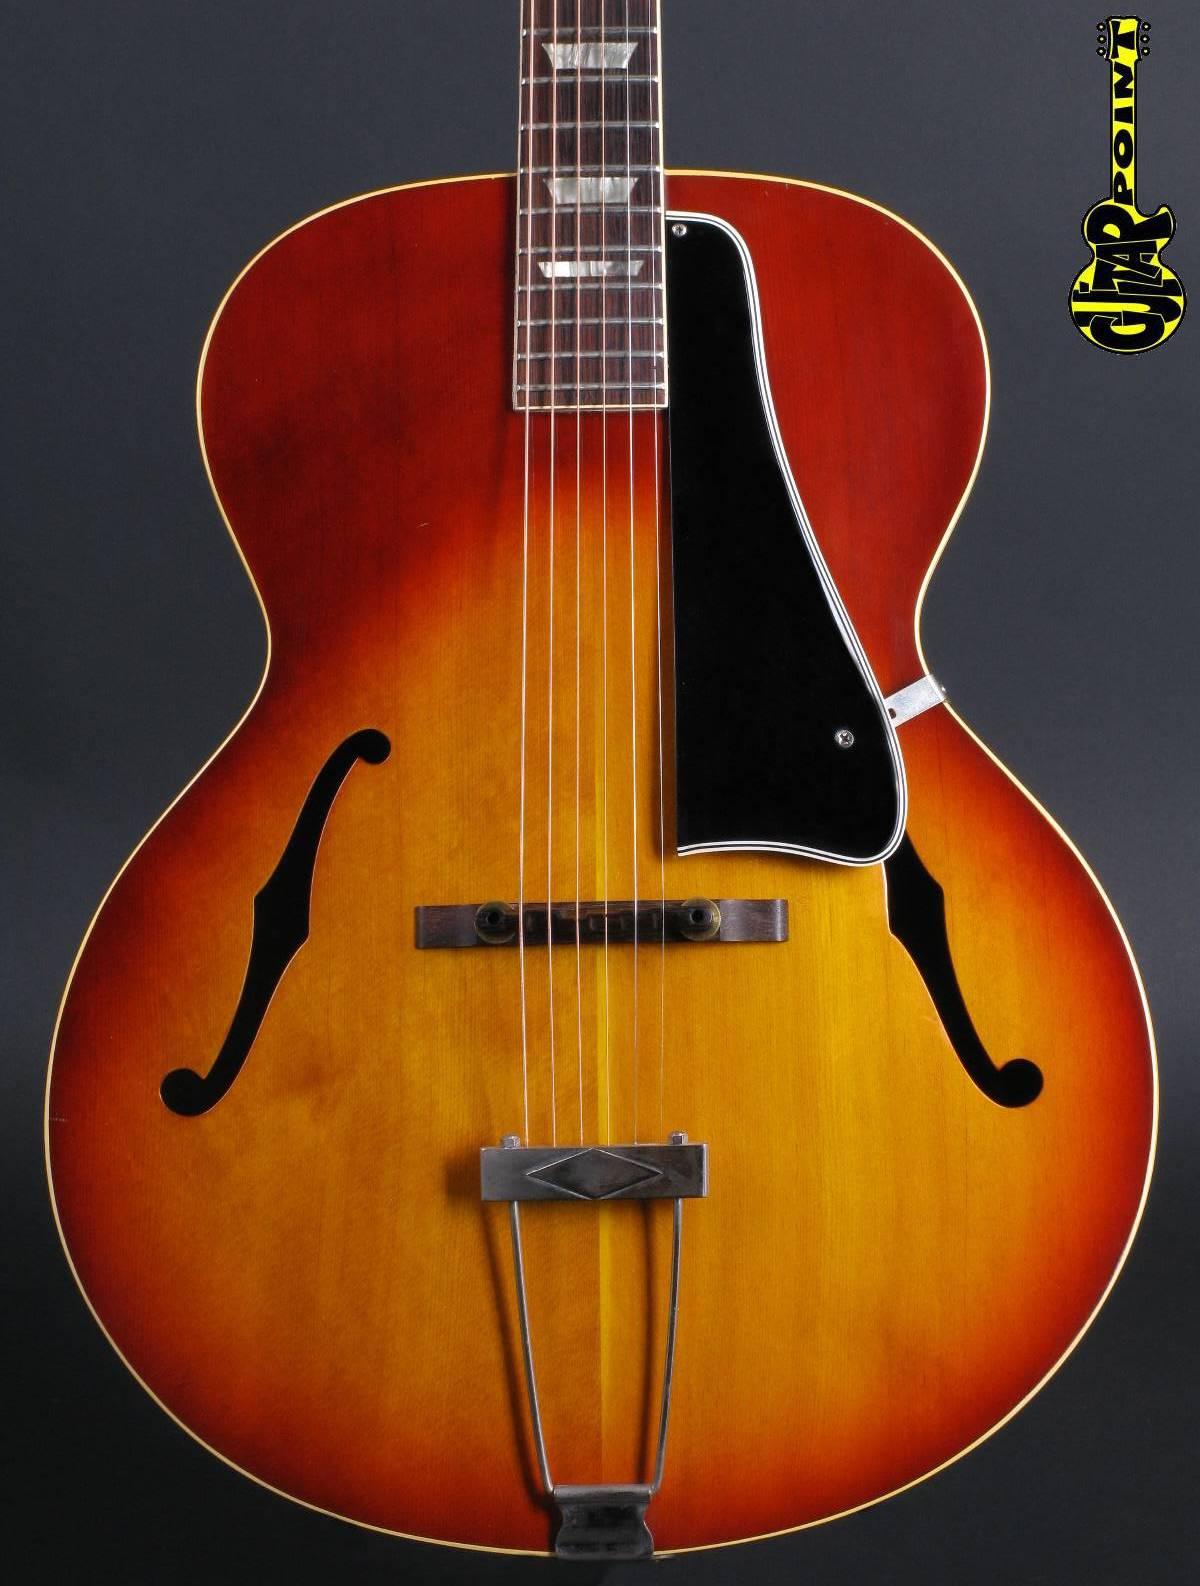 1965 Gibson L-50 - Sunburst